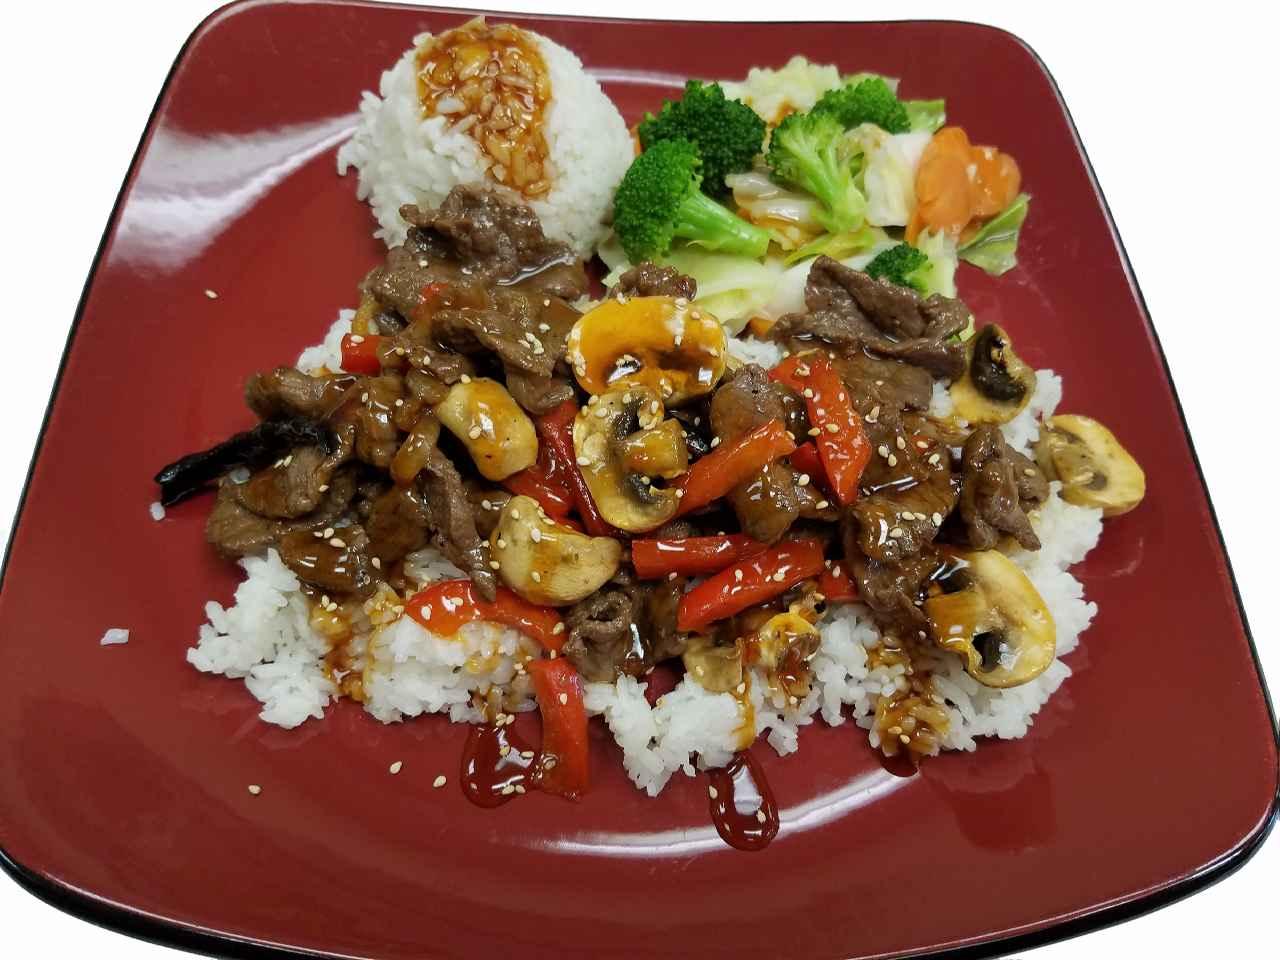 #5. Spicy Beef Bul-Go-Gi – HOT!